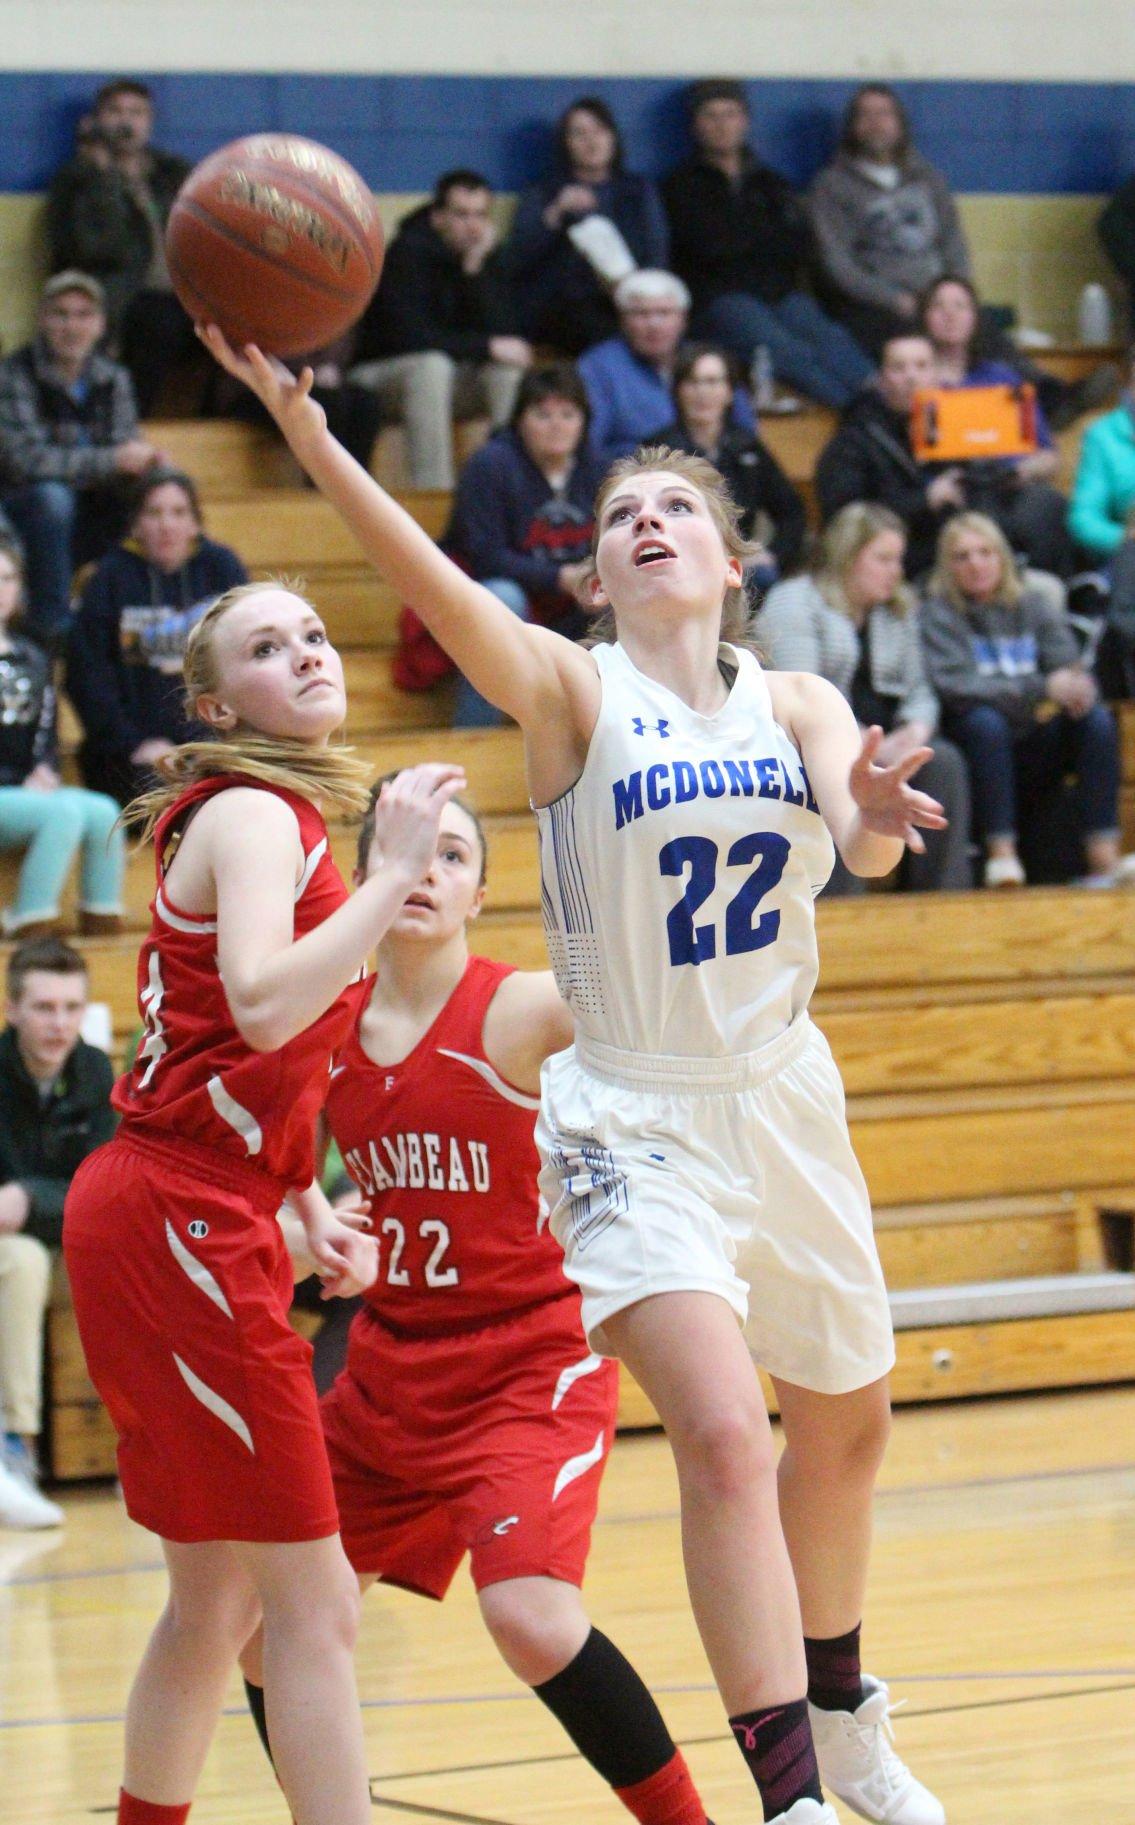 Flambeau at McDonell girls basketball 2-12-18